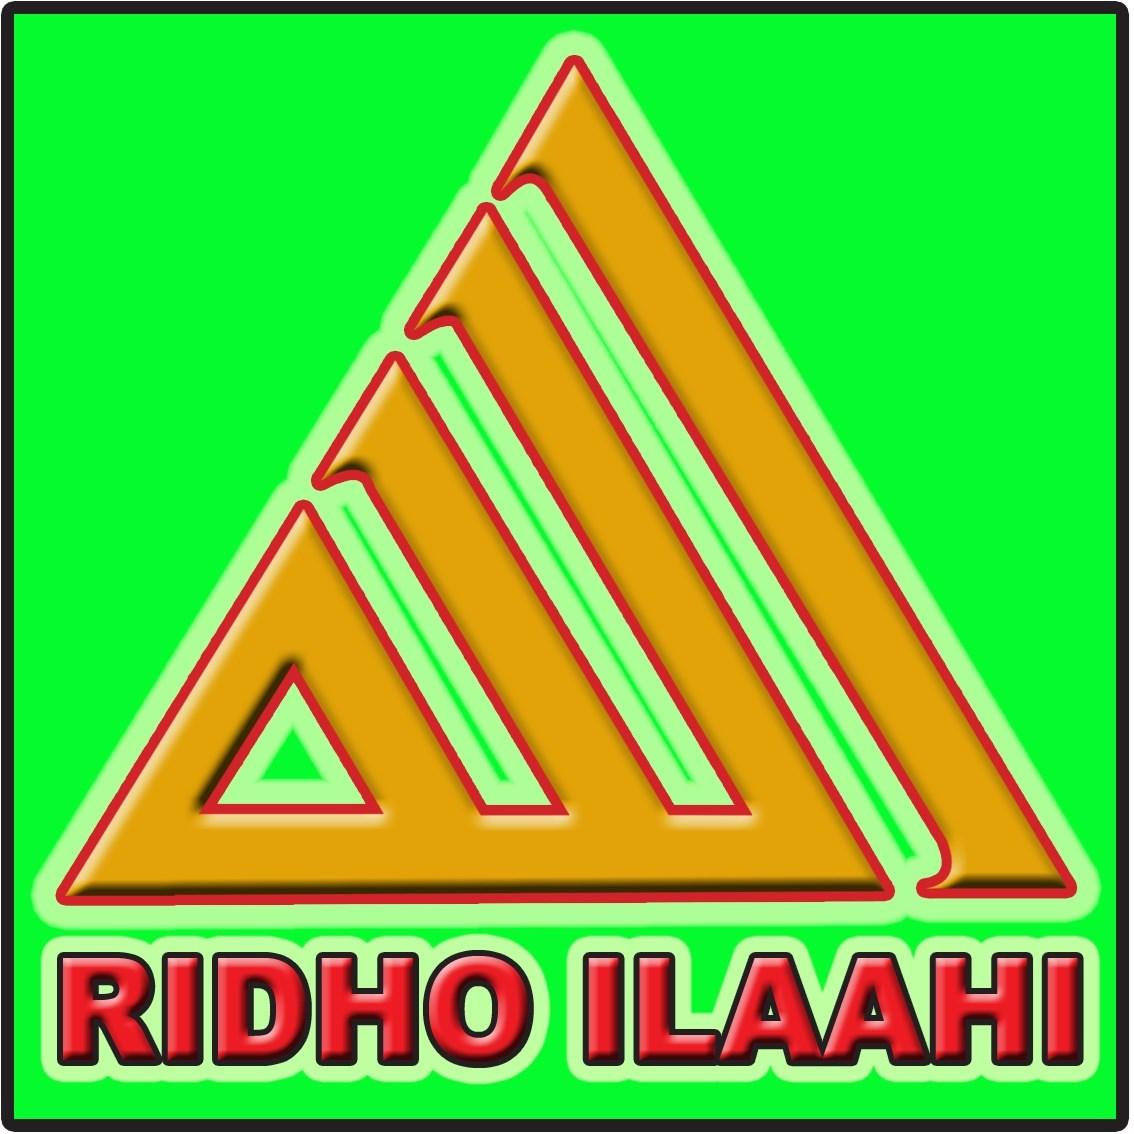 PT Ridho Ilaahi Ghayatuna